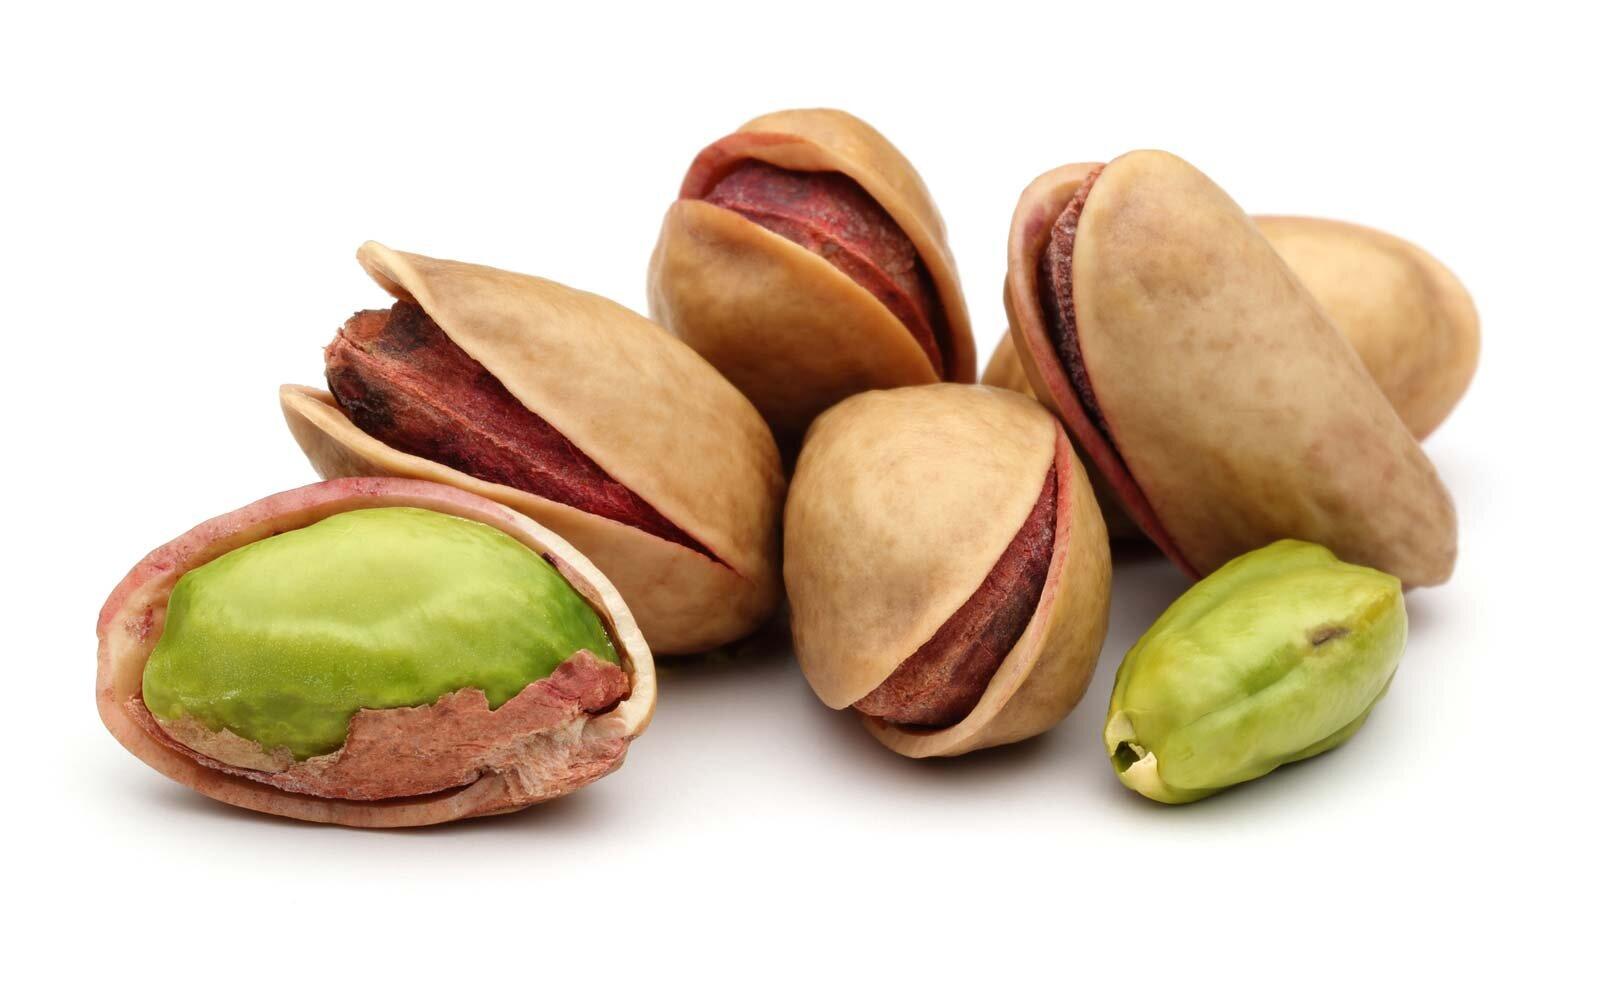 Pistachio Trees for Sale ― Perrys Fruit & Nut Nursery1000 x 630 jpeg 63kB